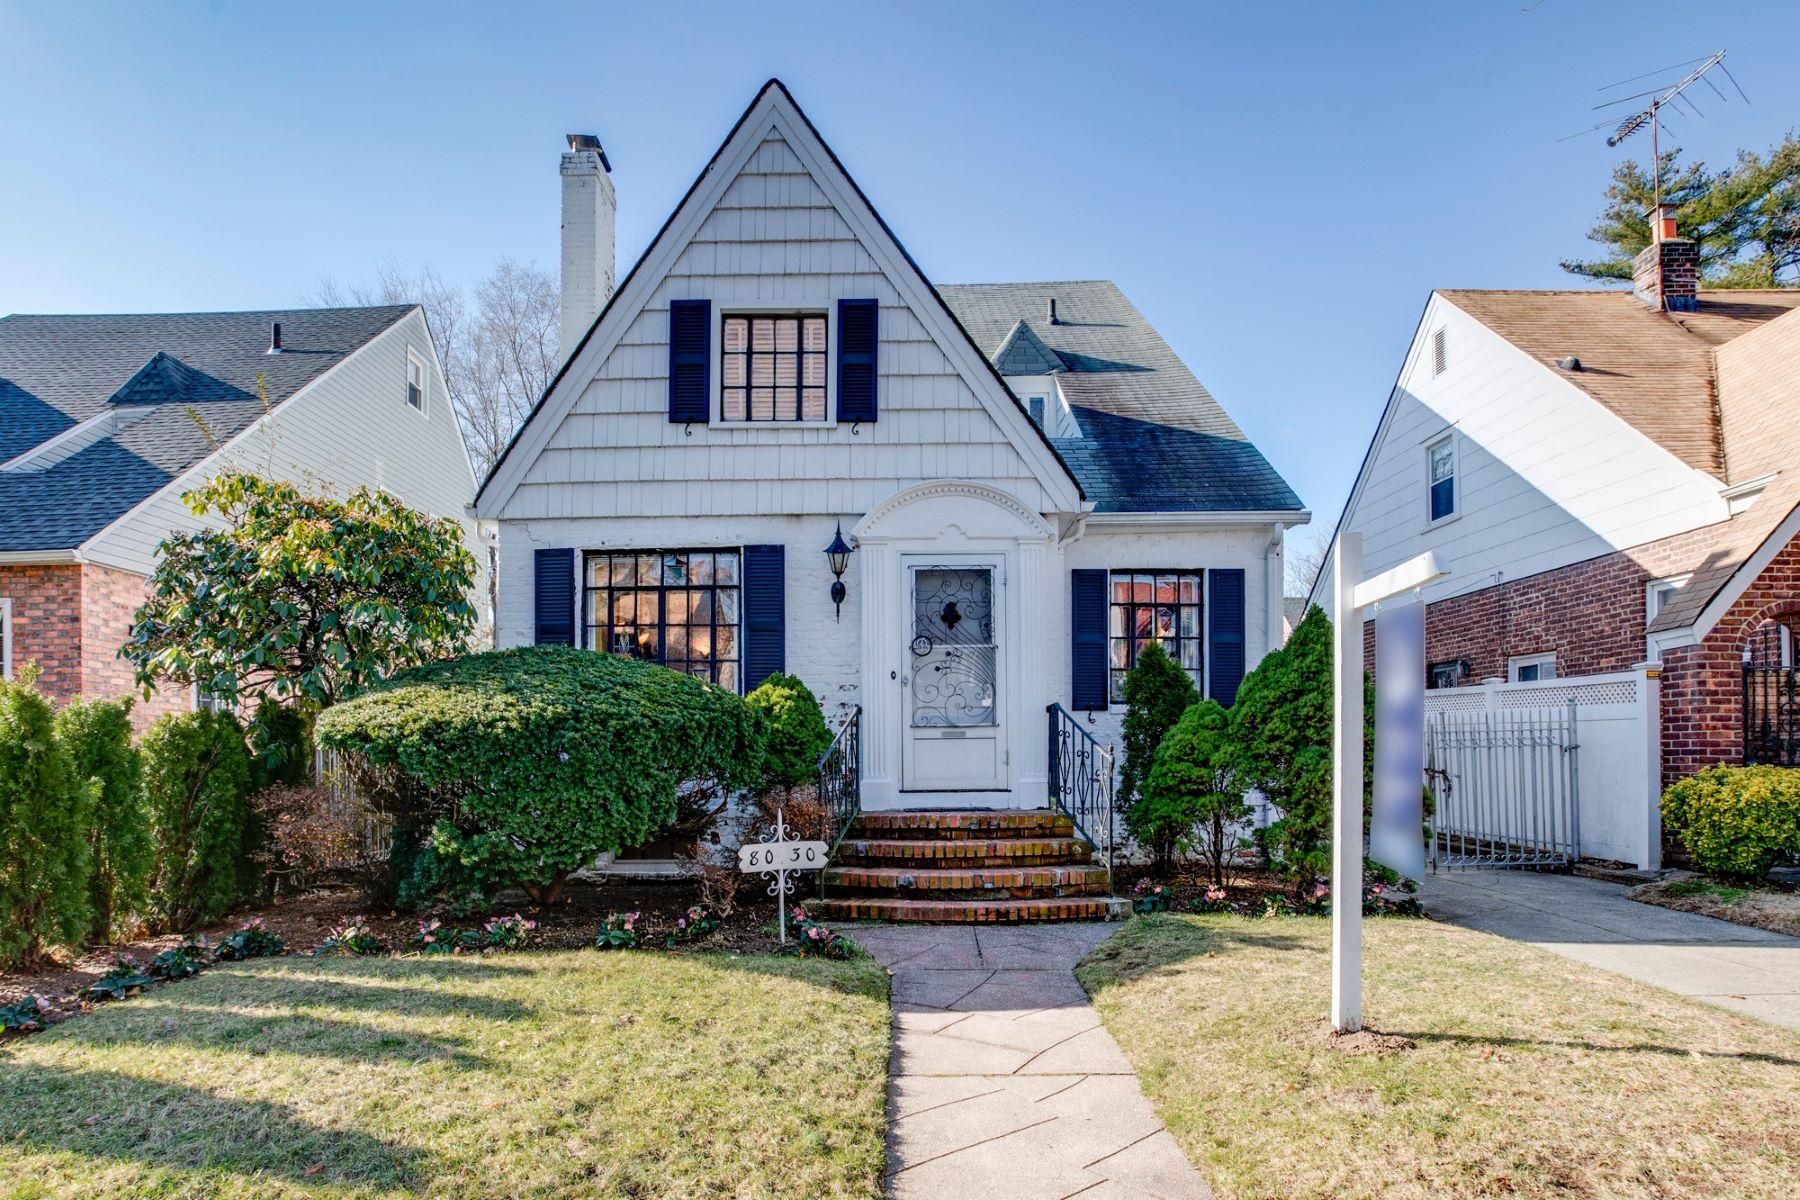 Single Family Homes for Active at Bellerose Manor 80-30 235 St Bellerose Manor, New York 11427 United States